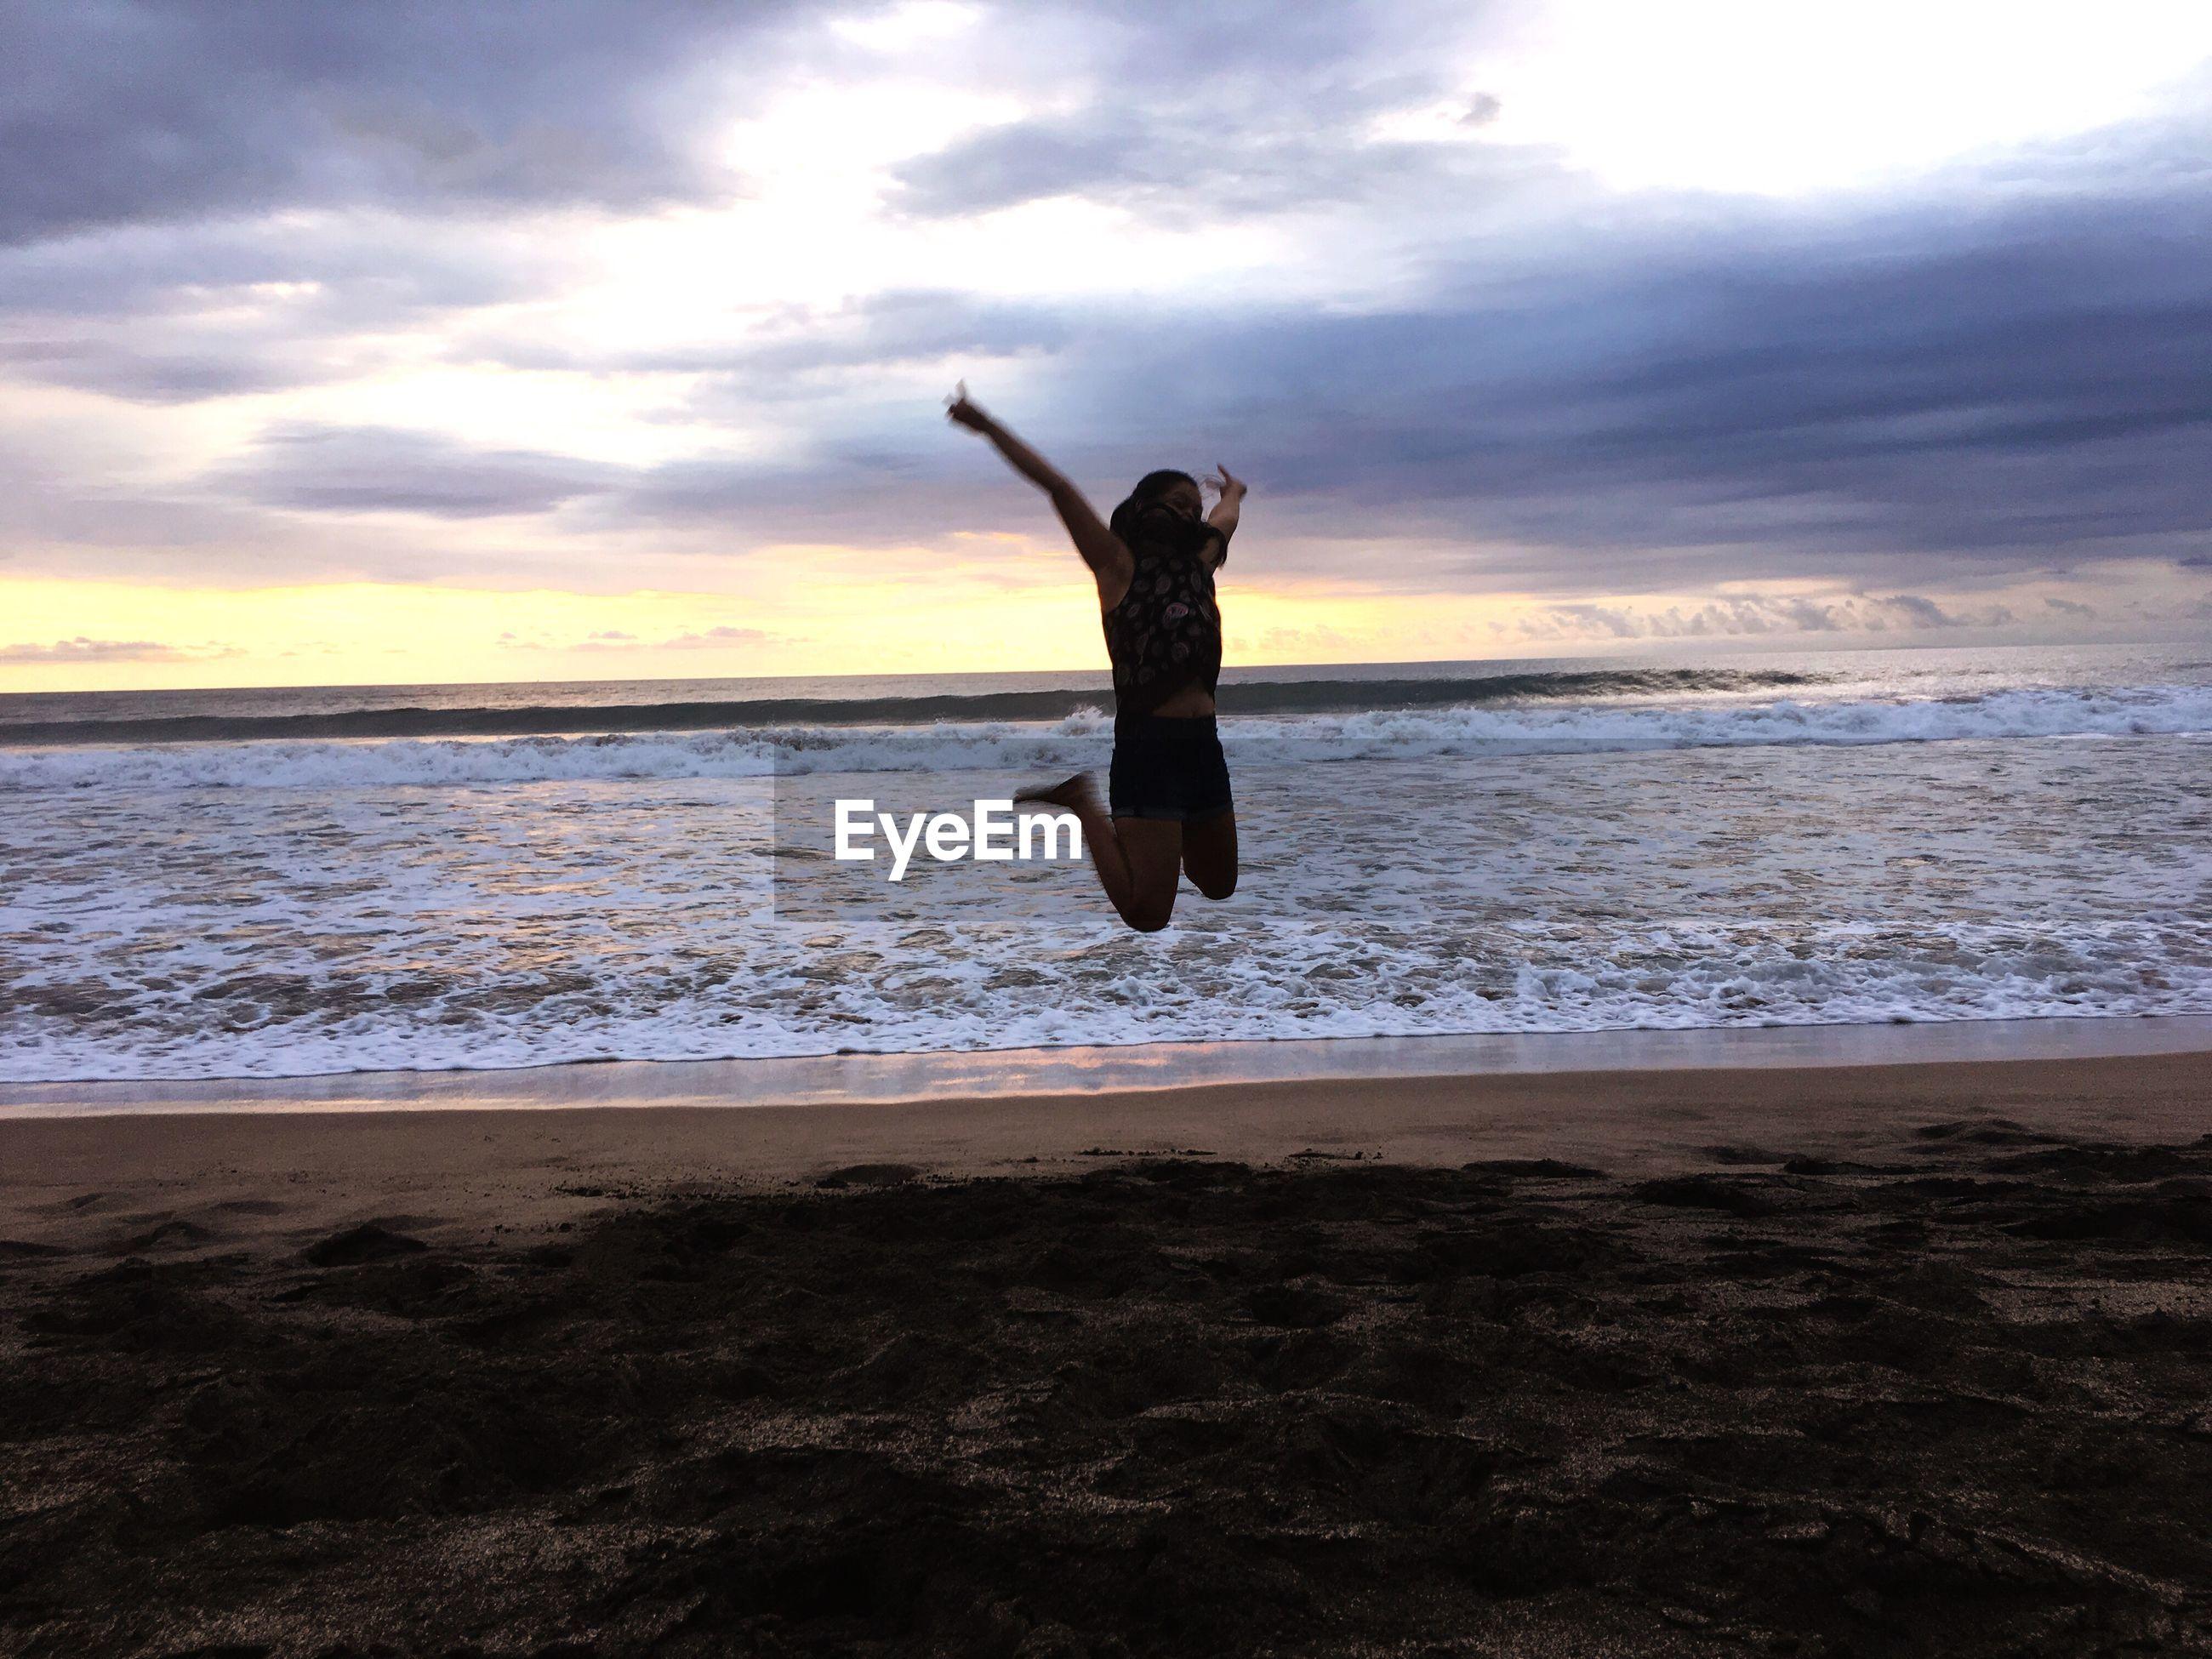 Playful woman jumping at beach during sunset